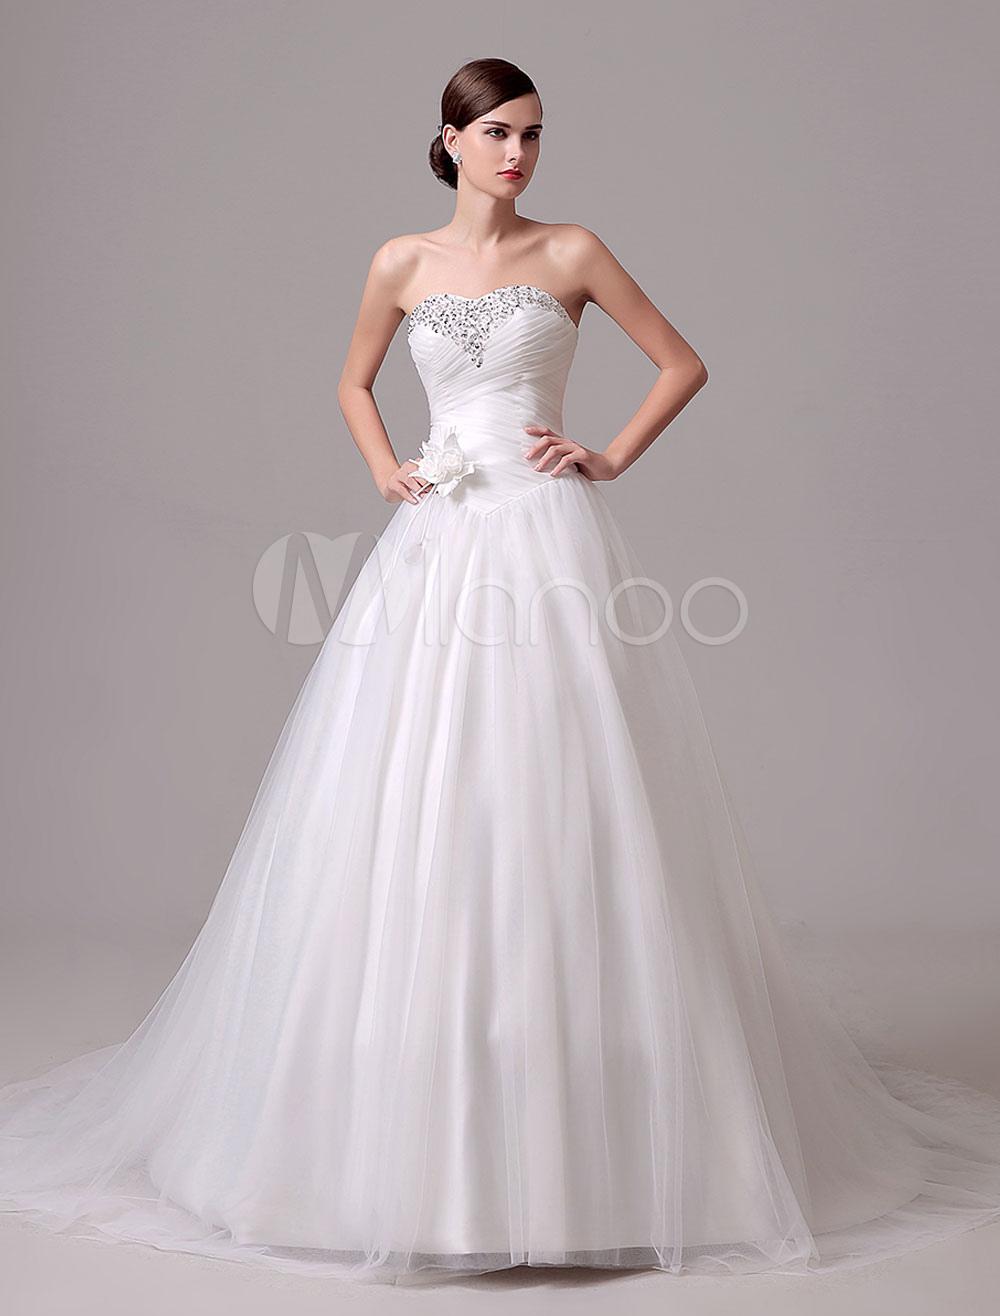 Robe de mari e dos nu strass id es et d 39 inspiration sur le mariage - Robe de mariee strass ...